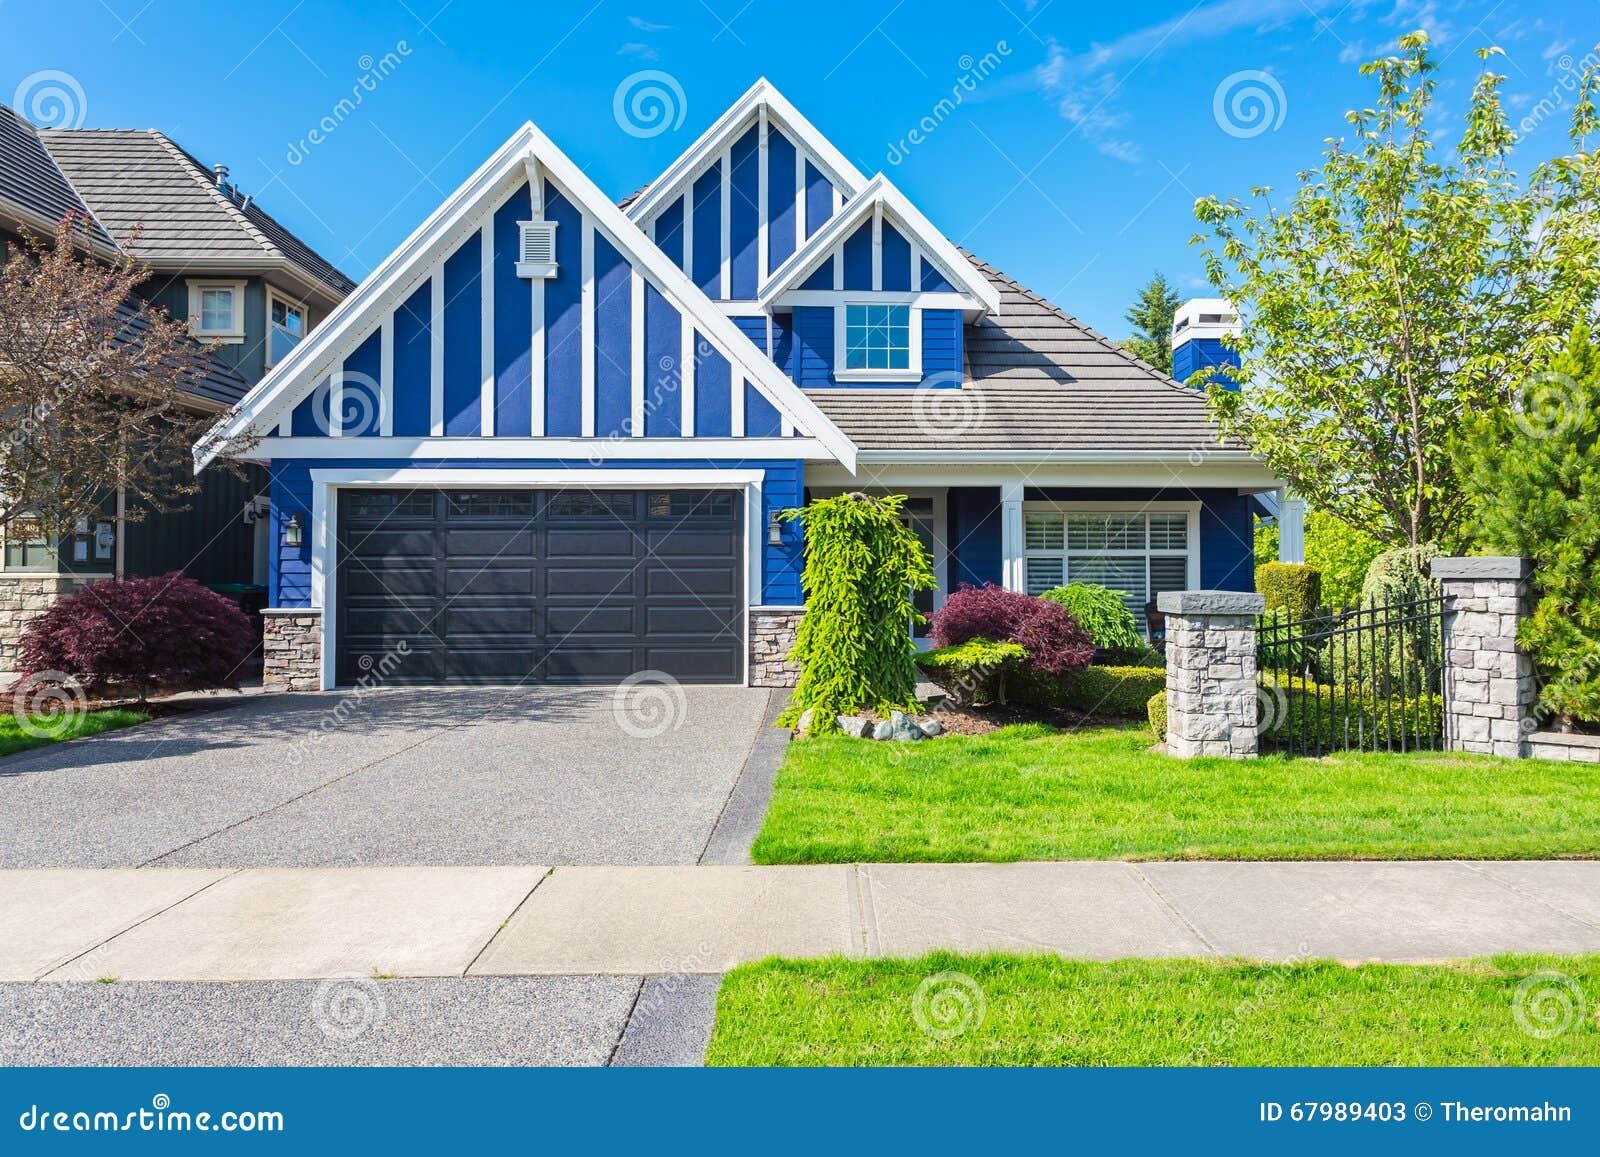 Custom Built House Stock Photo Image 67989403